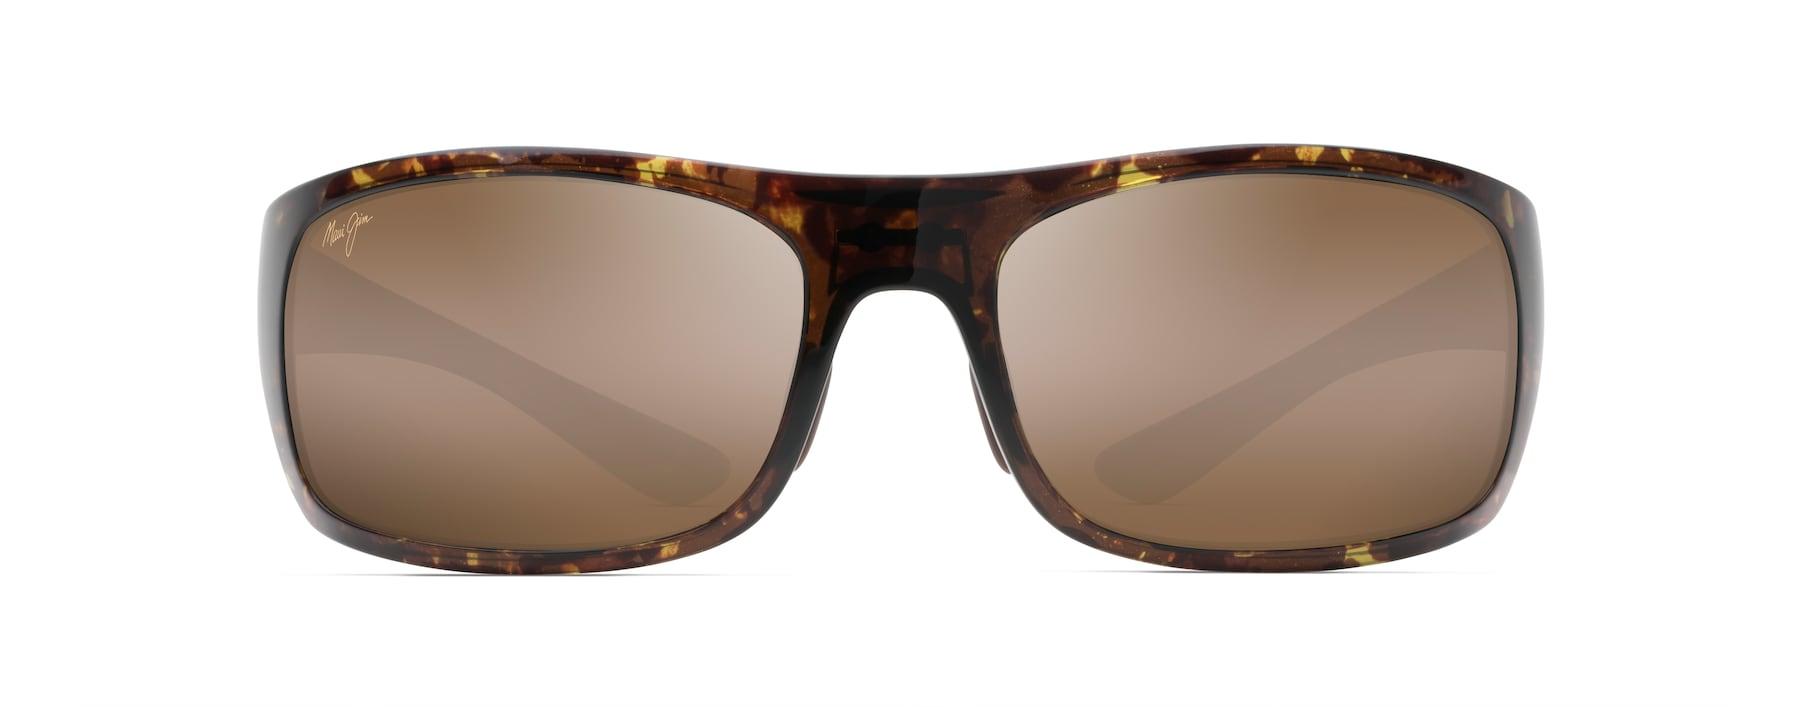 4dae18bba7 Big Wave Polarized Sunglasses